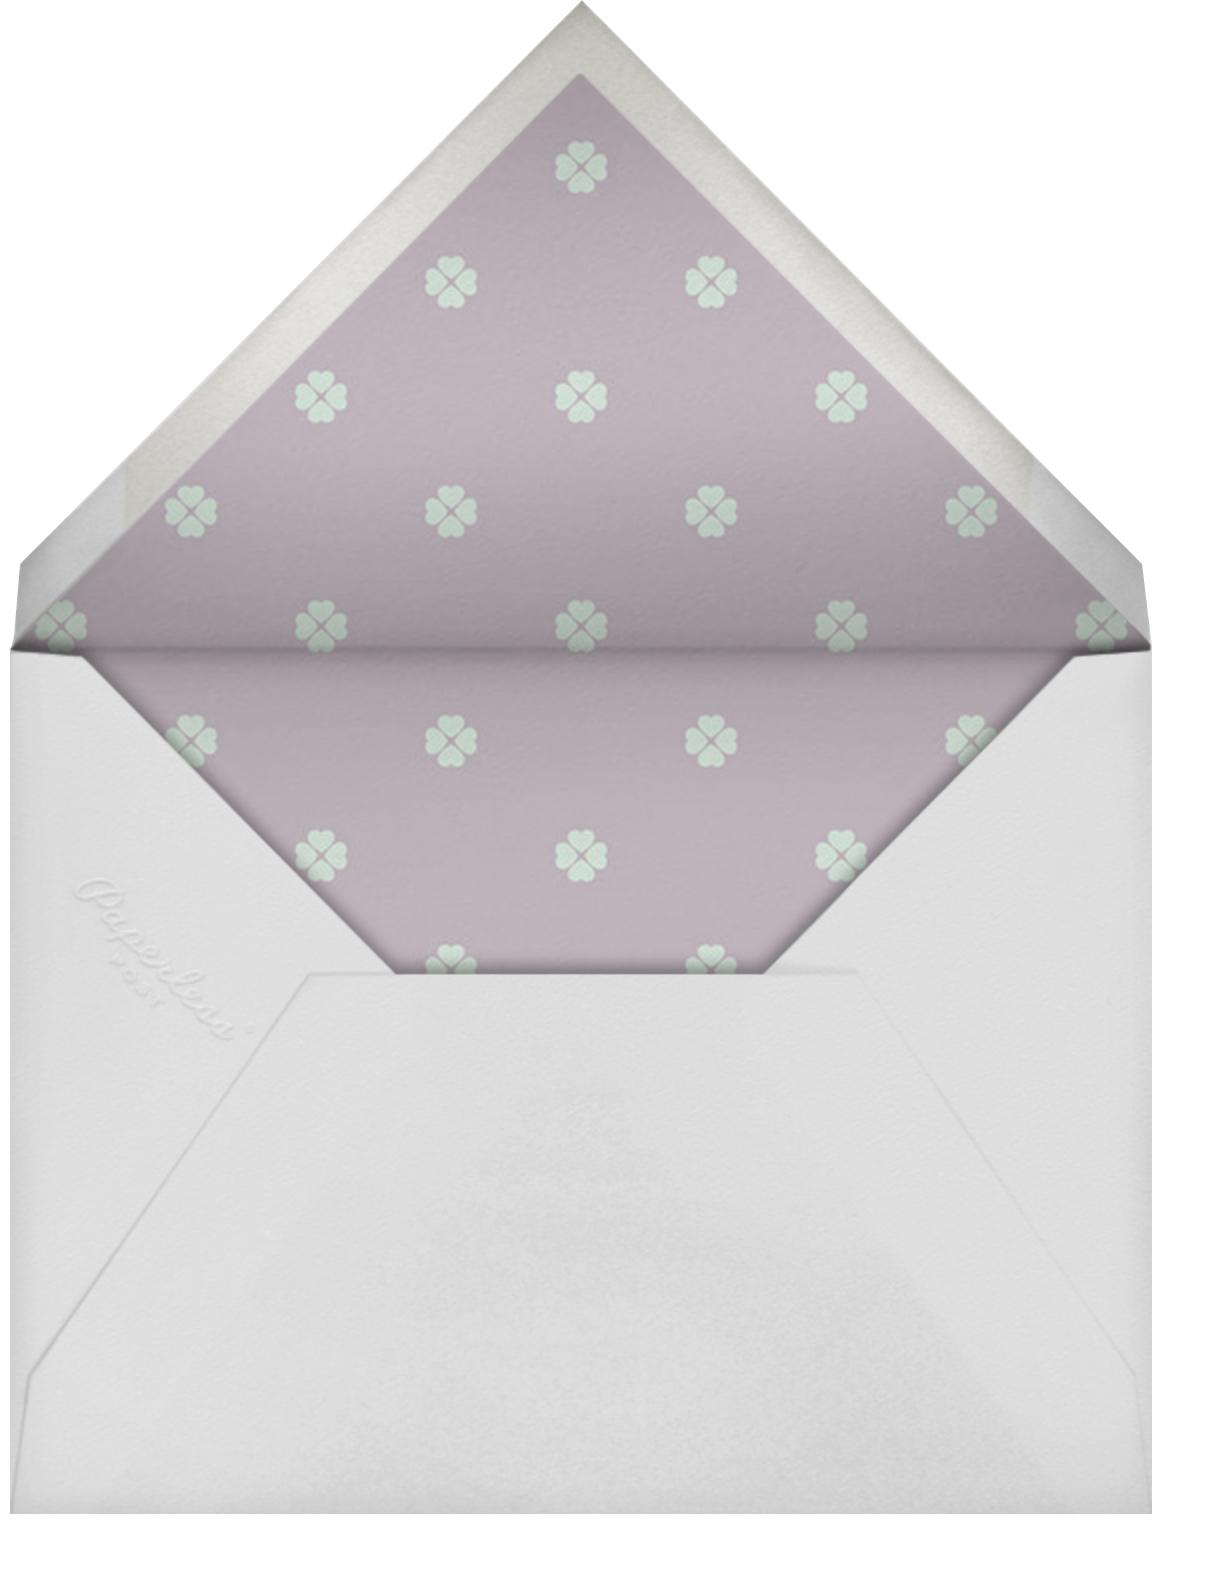 Colorblocked Stripes - Lilac/Mint - kate spade new york - Baby shower - envelope back